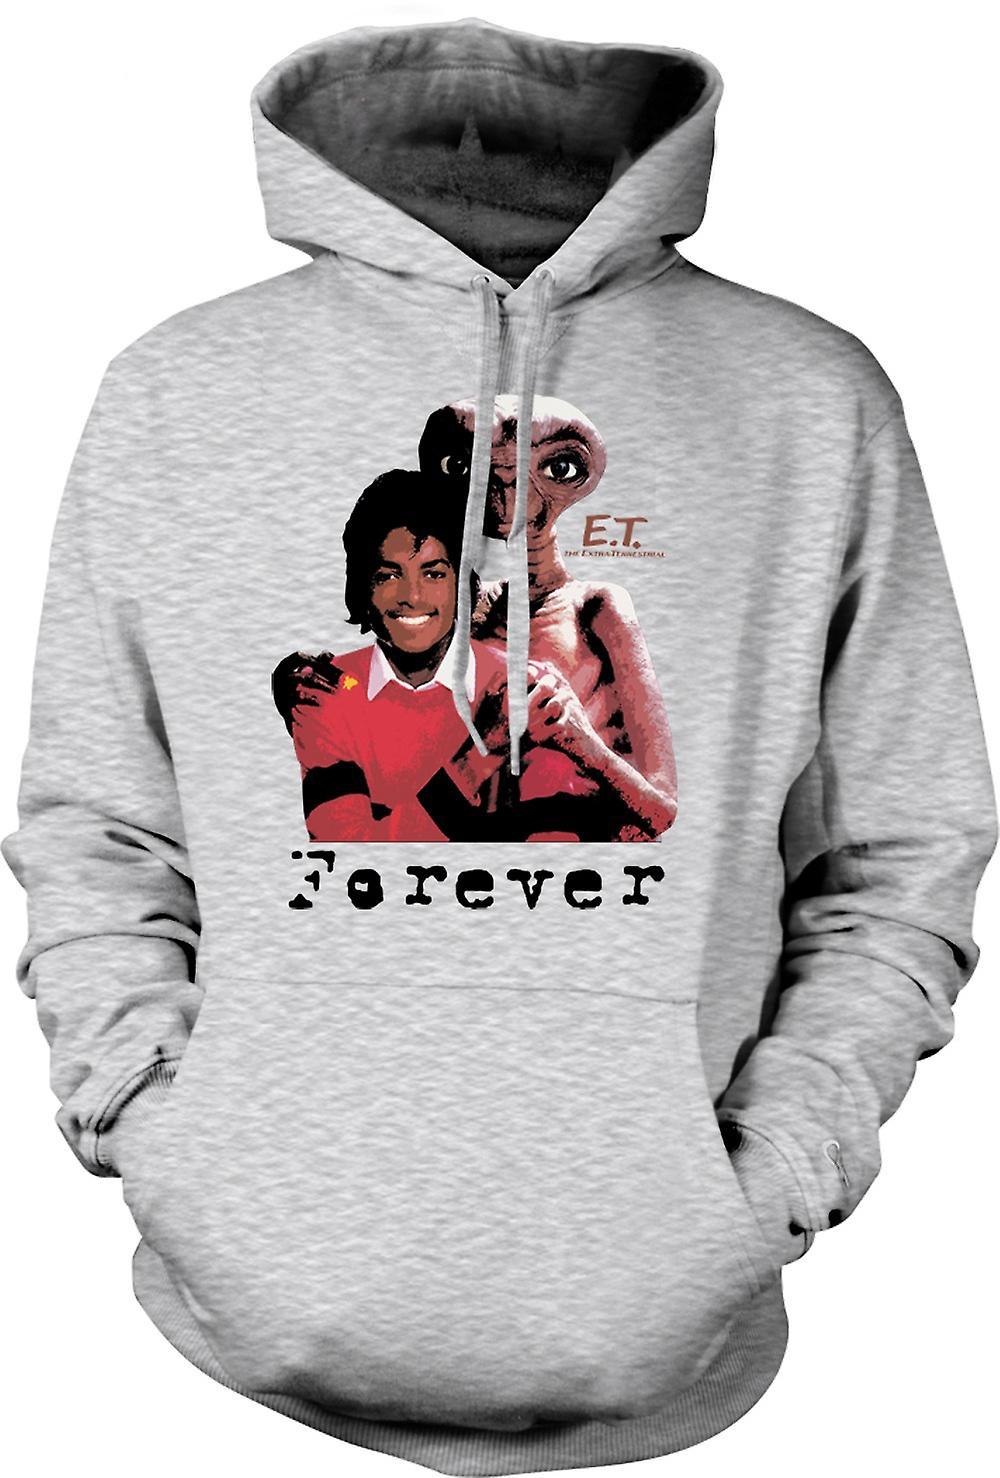 Mens Hoodie - Et Michael Jackson - Alien per sempre